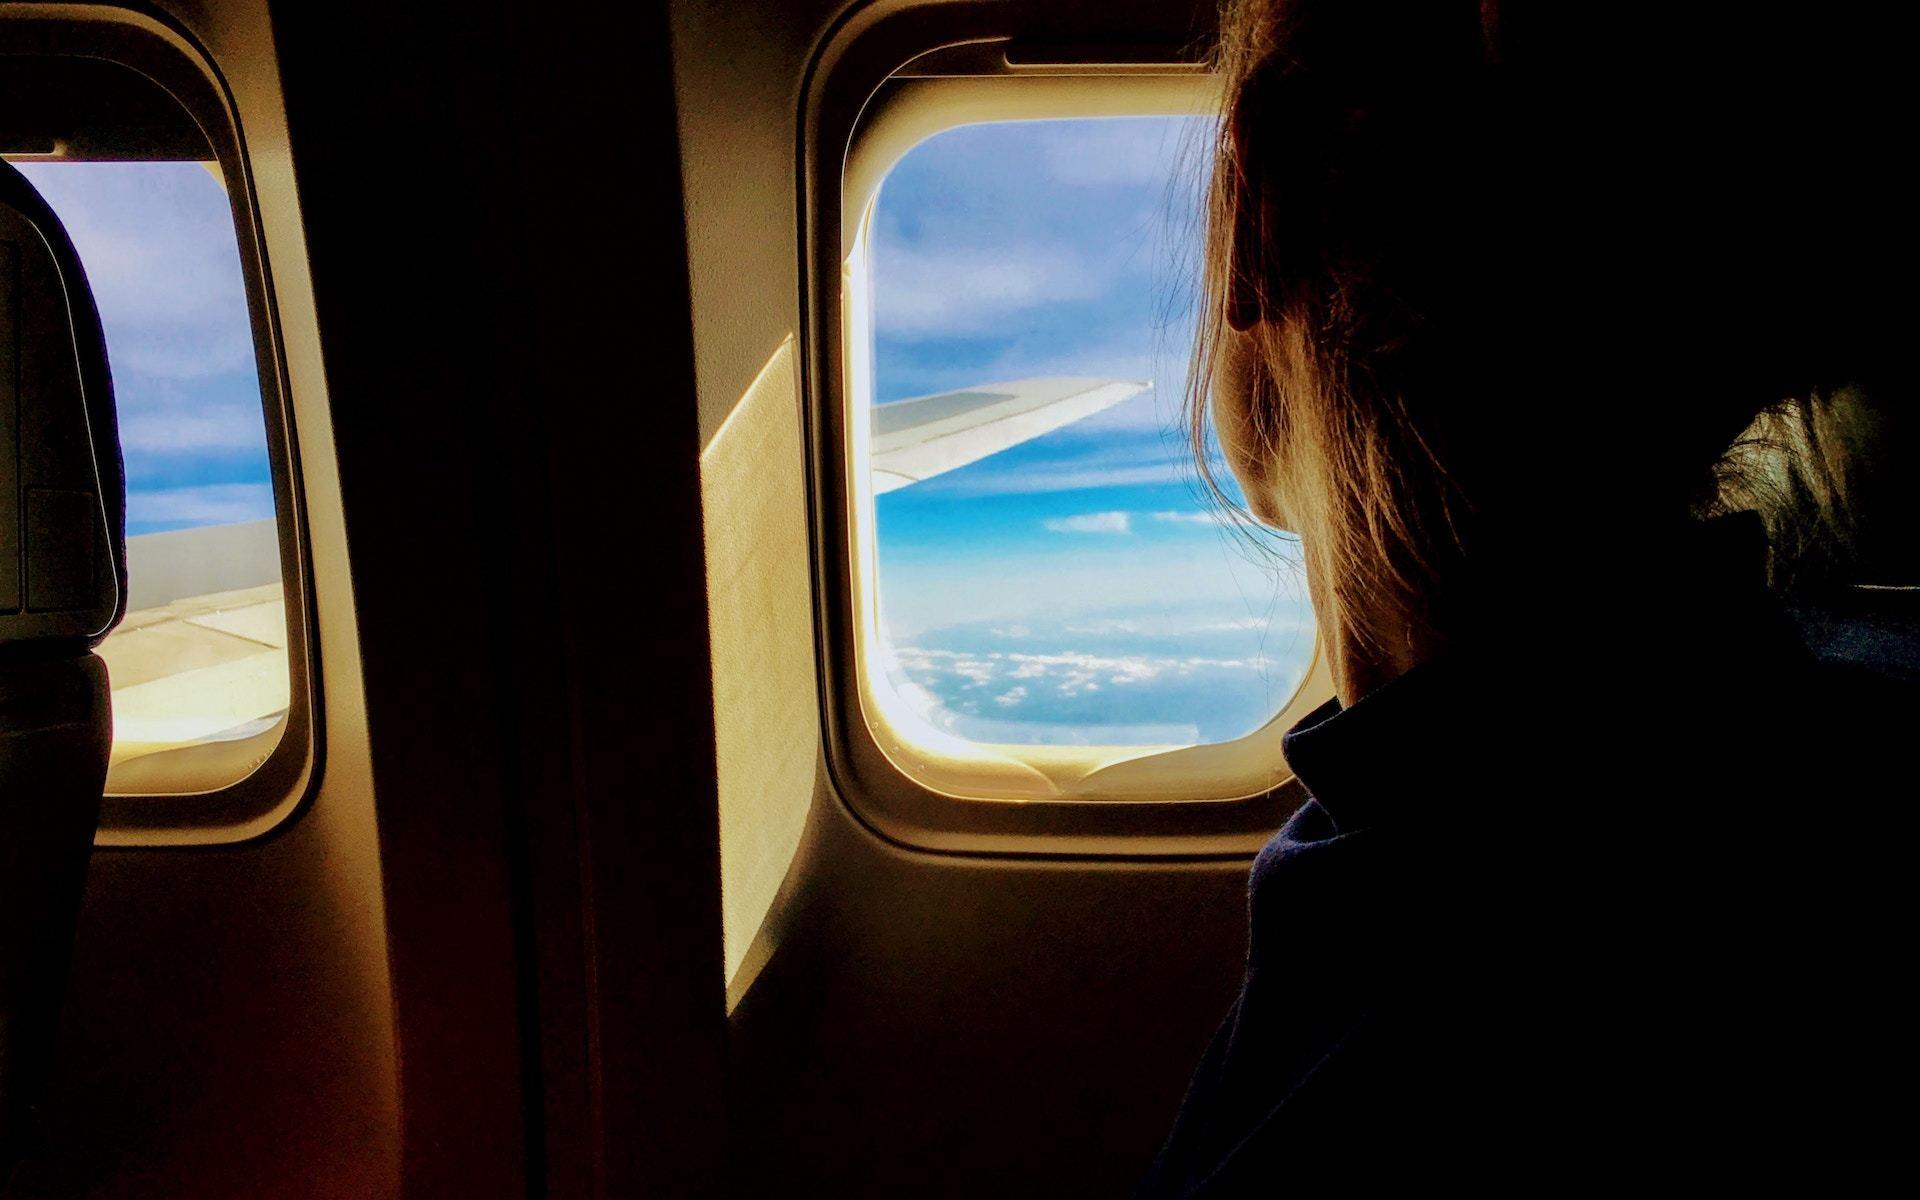 Interior de un avión de un vuelo de larga distancia.